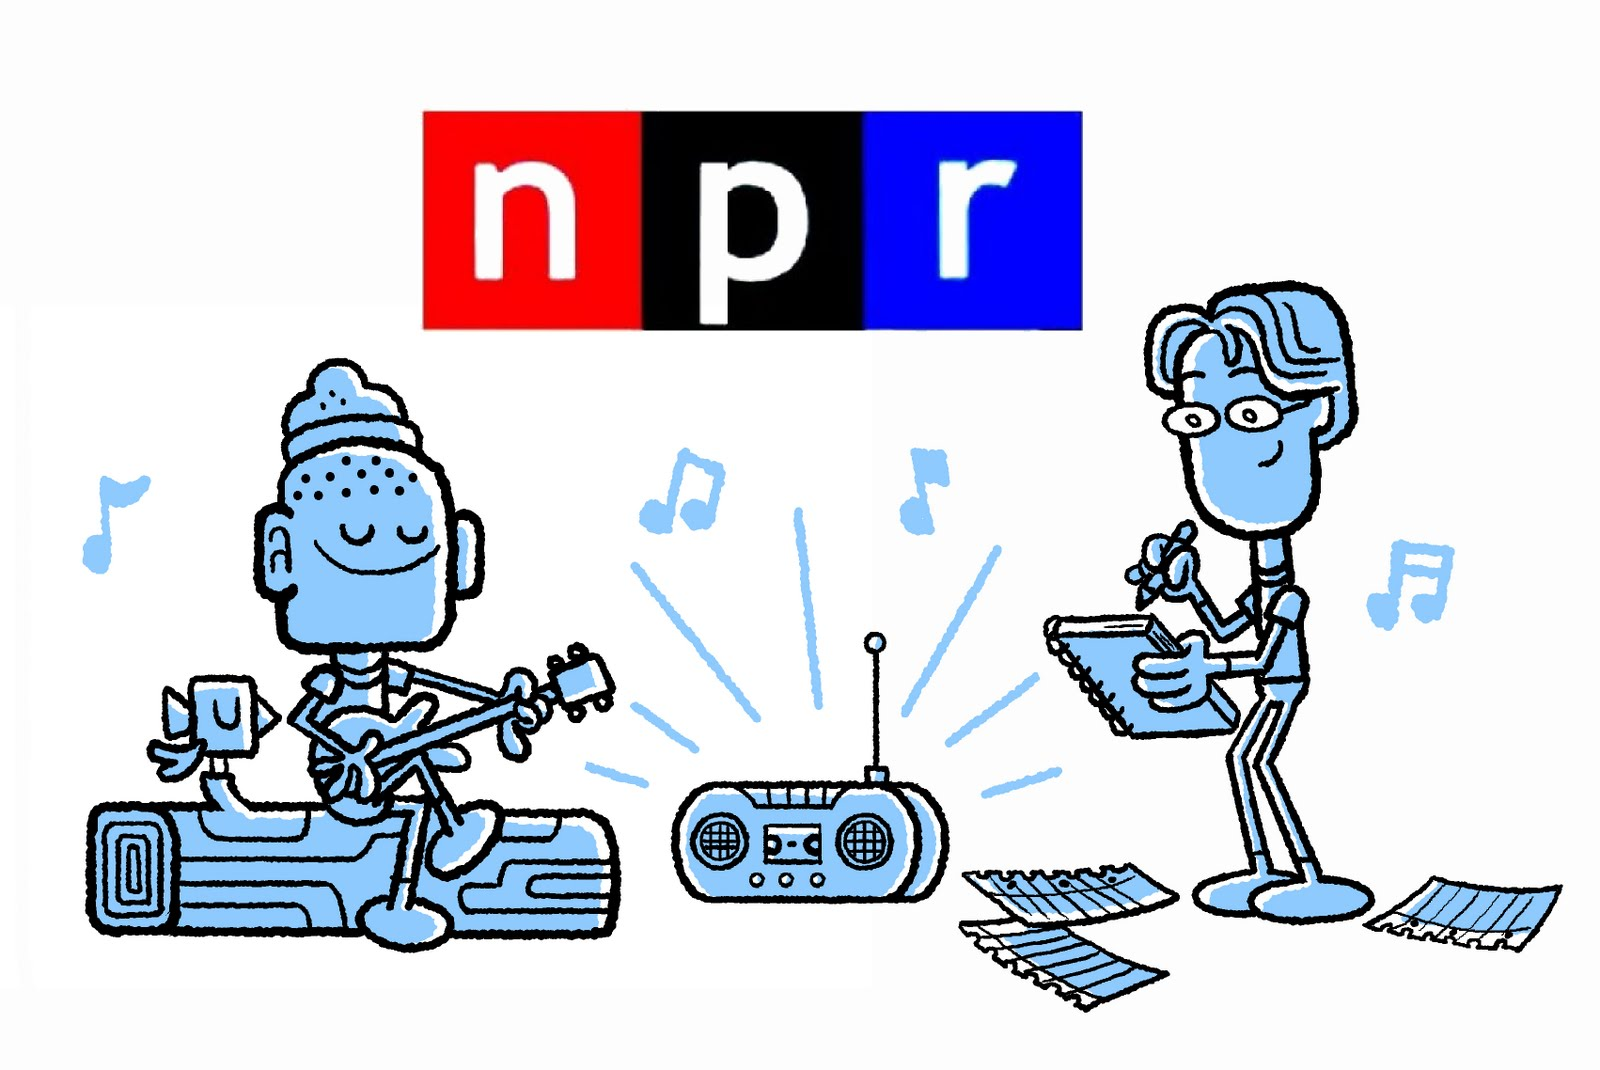 NPR singing